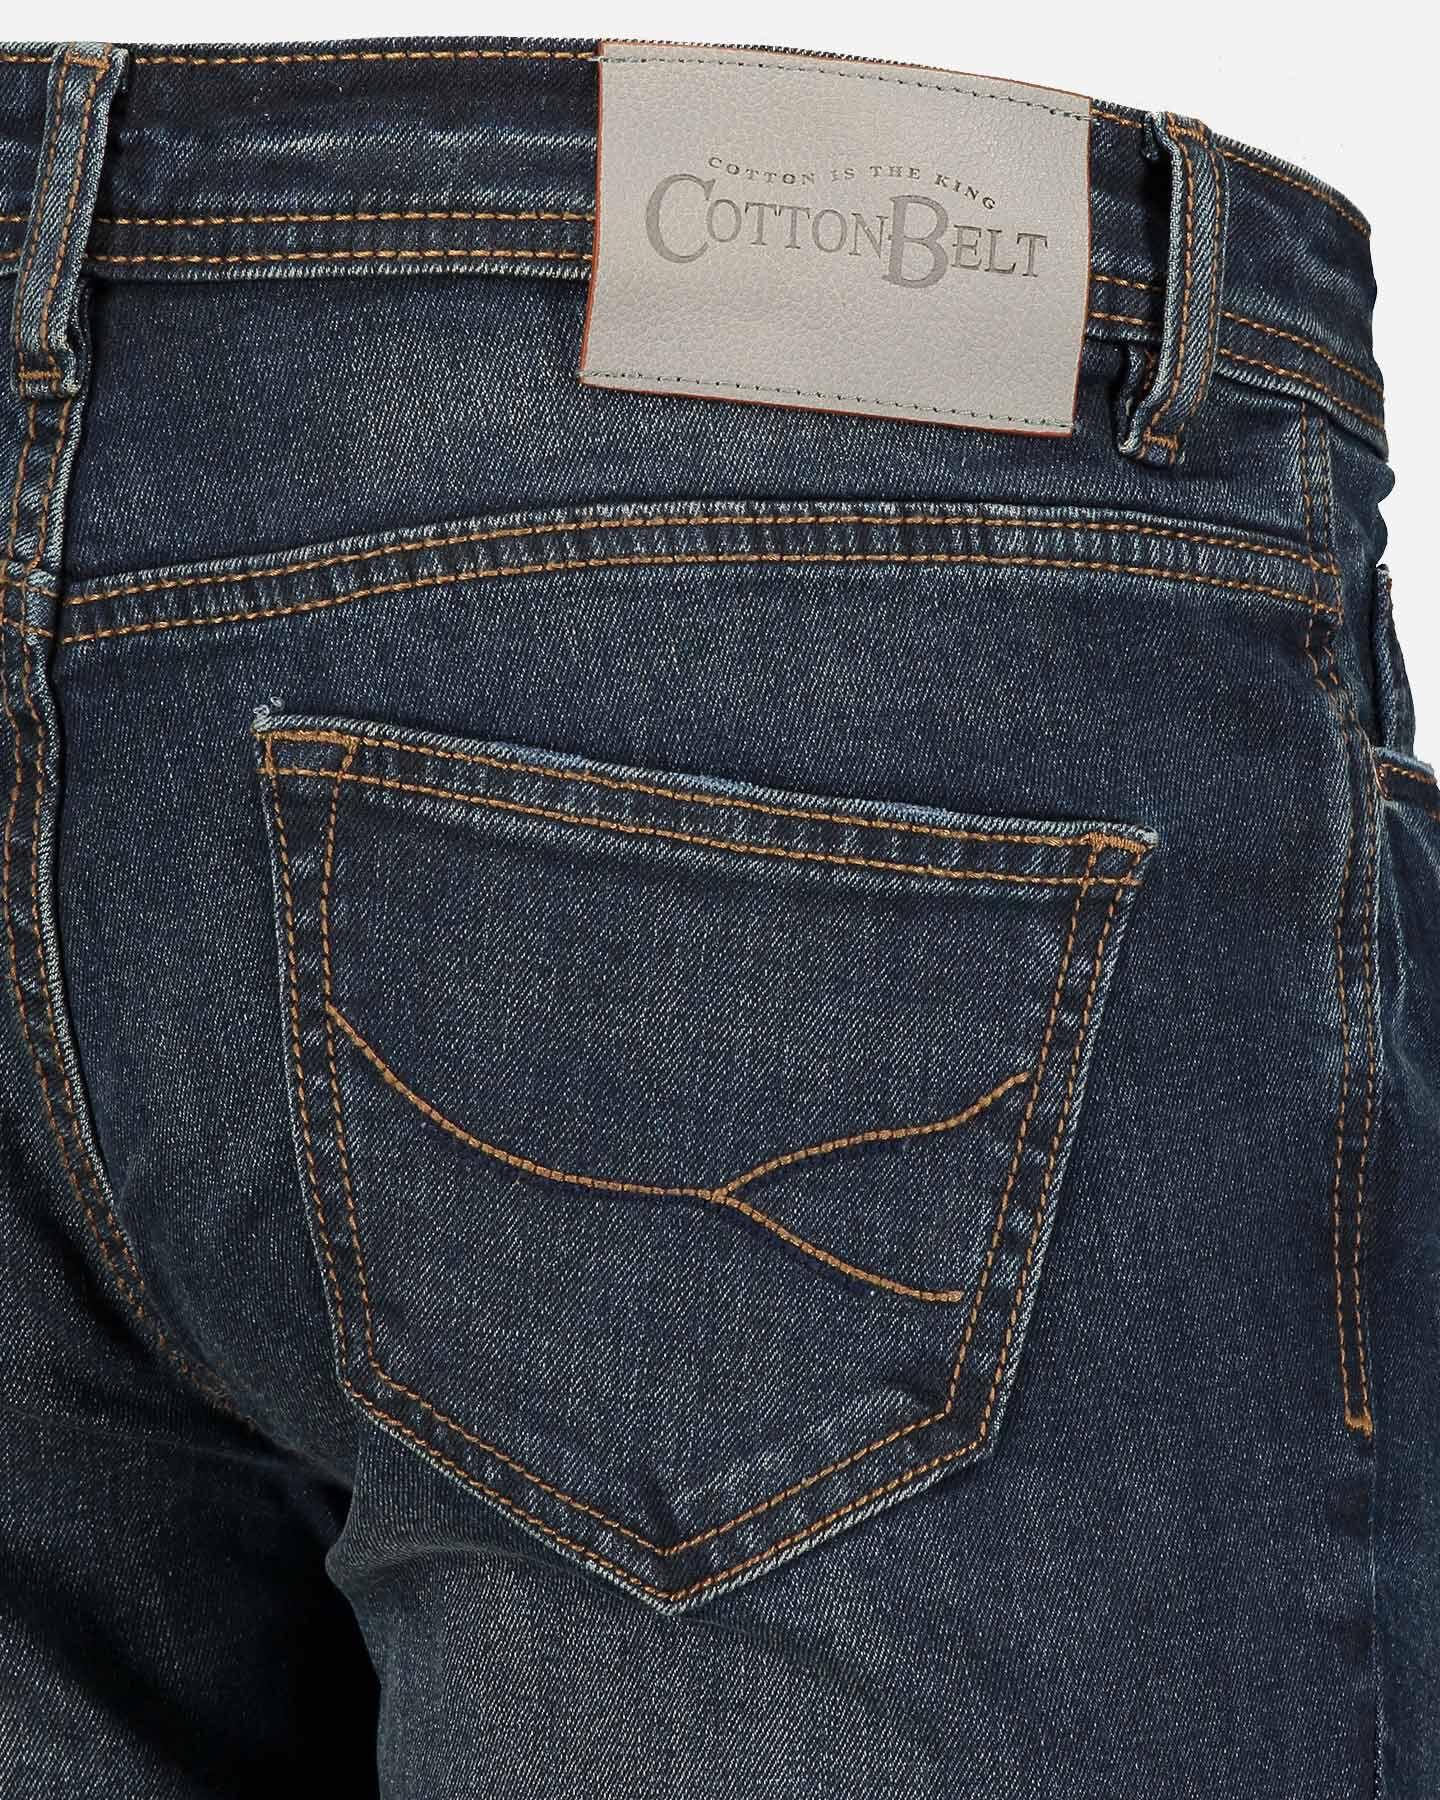 Jeans COTTON BELT GREGOR SLIM M S4070912 scatto 4